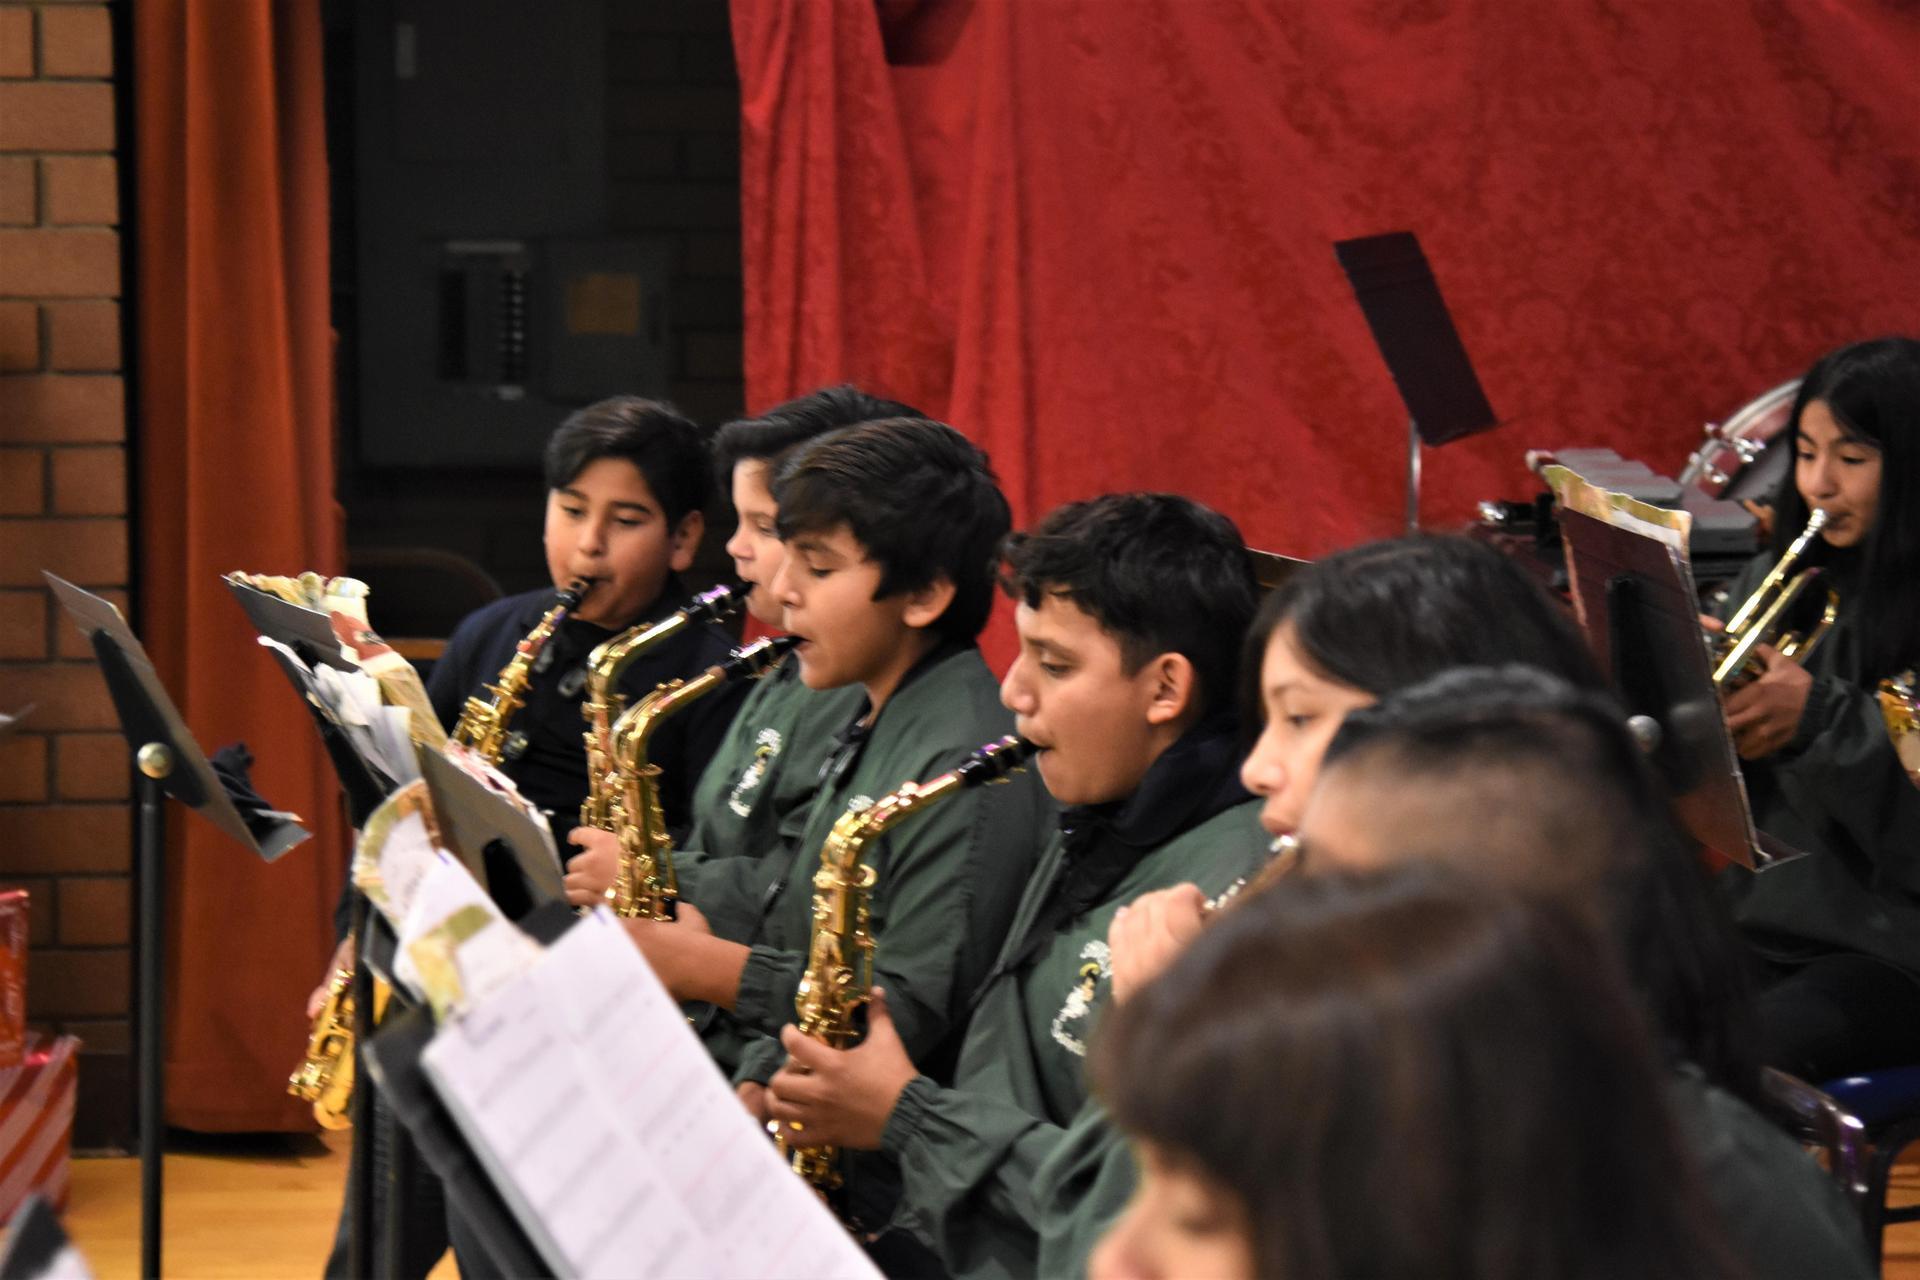 Band at Senior Center 2019